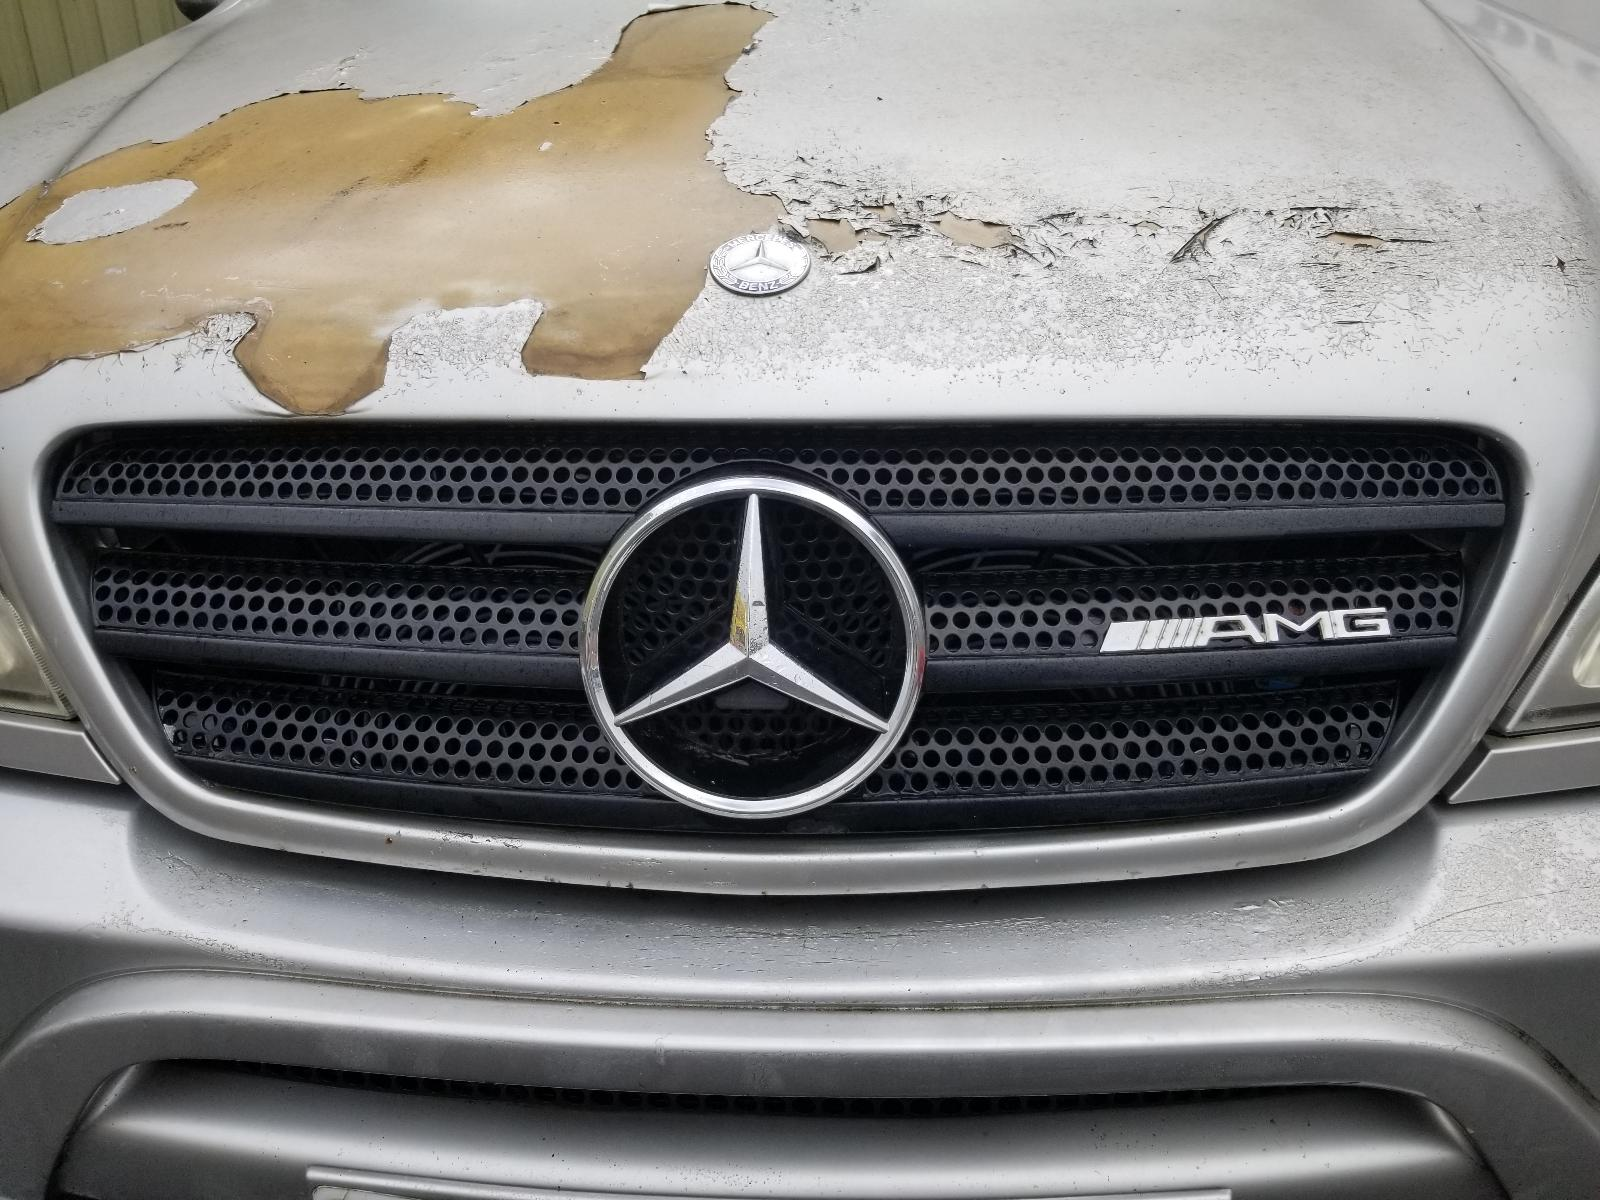 View Auto part Steering Hose Mercedes M Class 2003